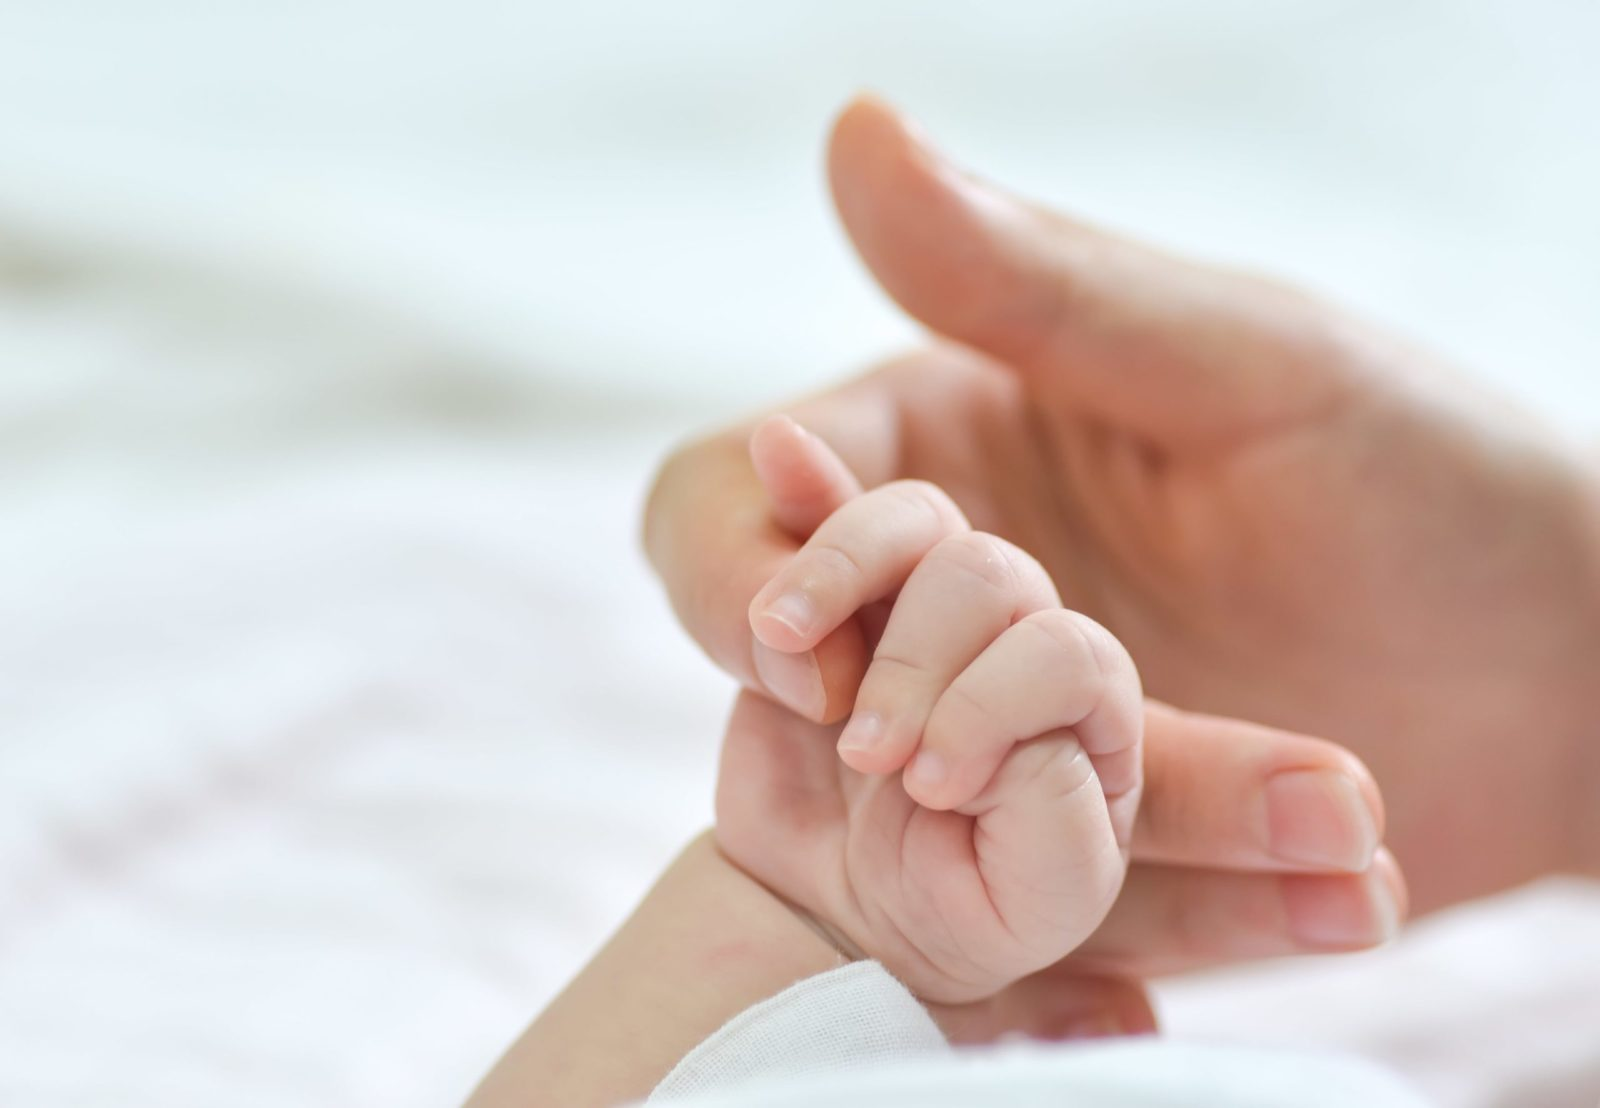 علامات-الولاده-بدون-طلق